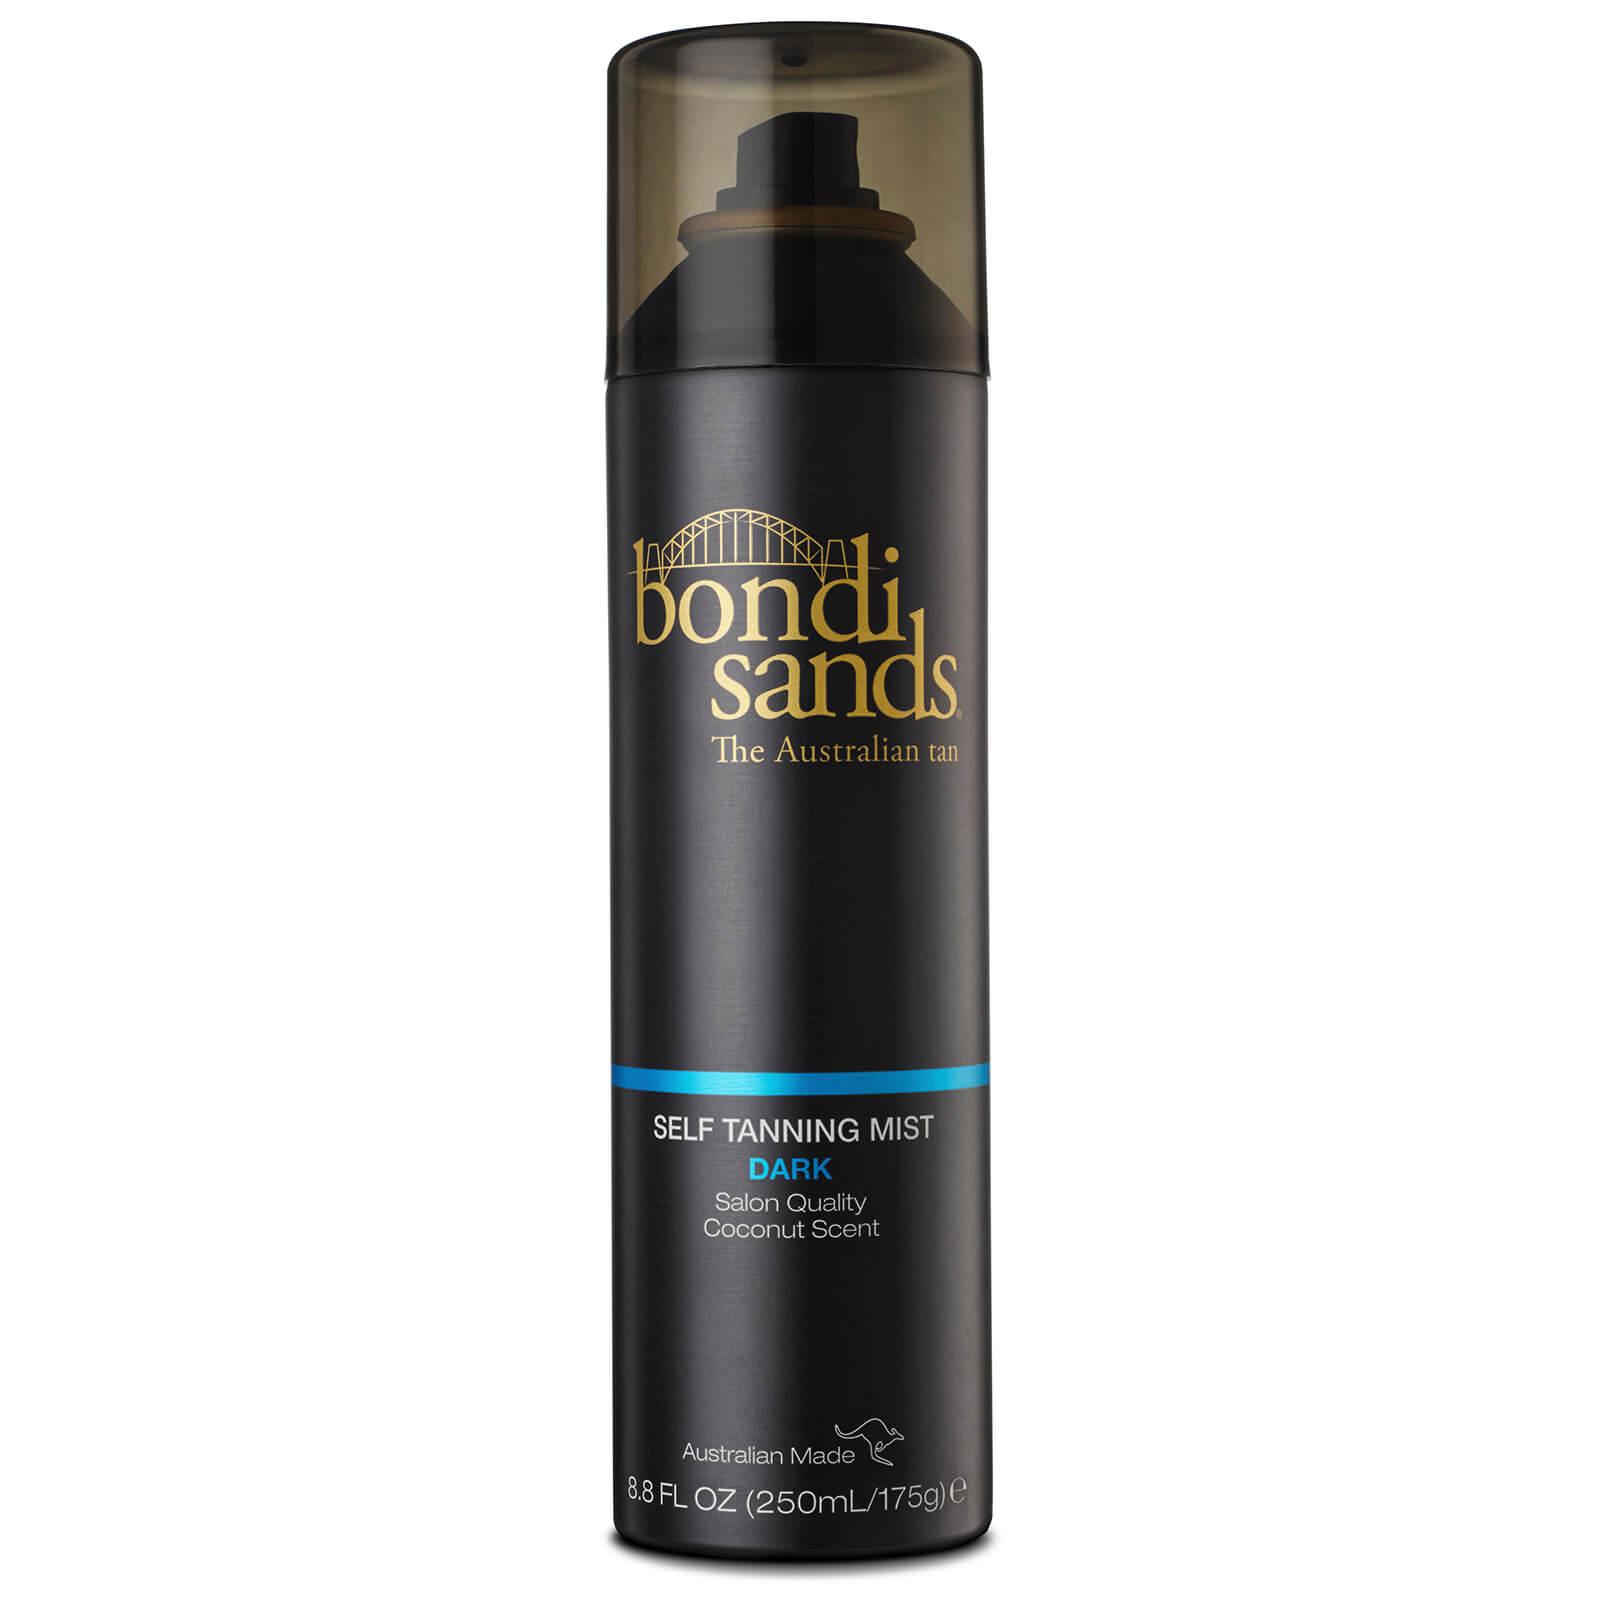 Bondi Sands Self Tanning Mist 250ml Dark Beautyexpert A Dha Cream Hologram Product Description